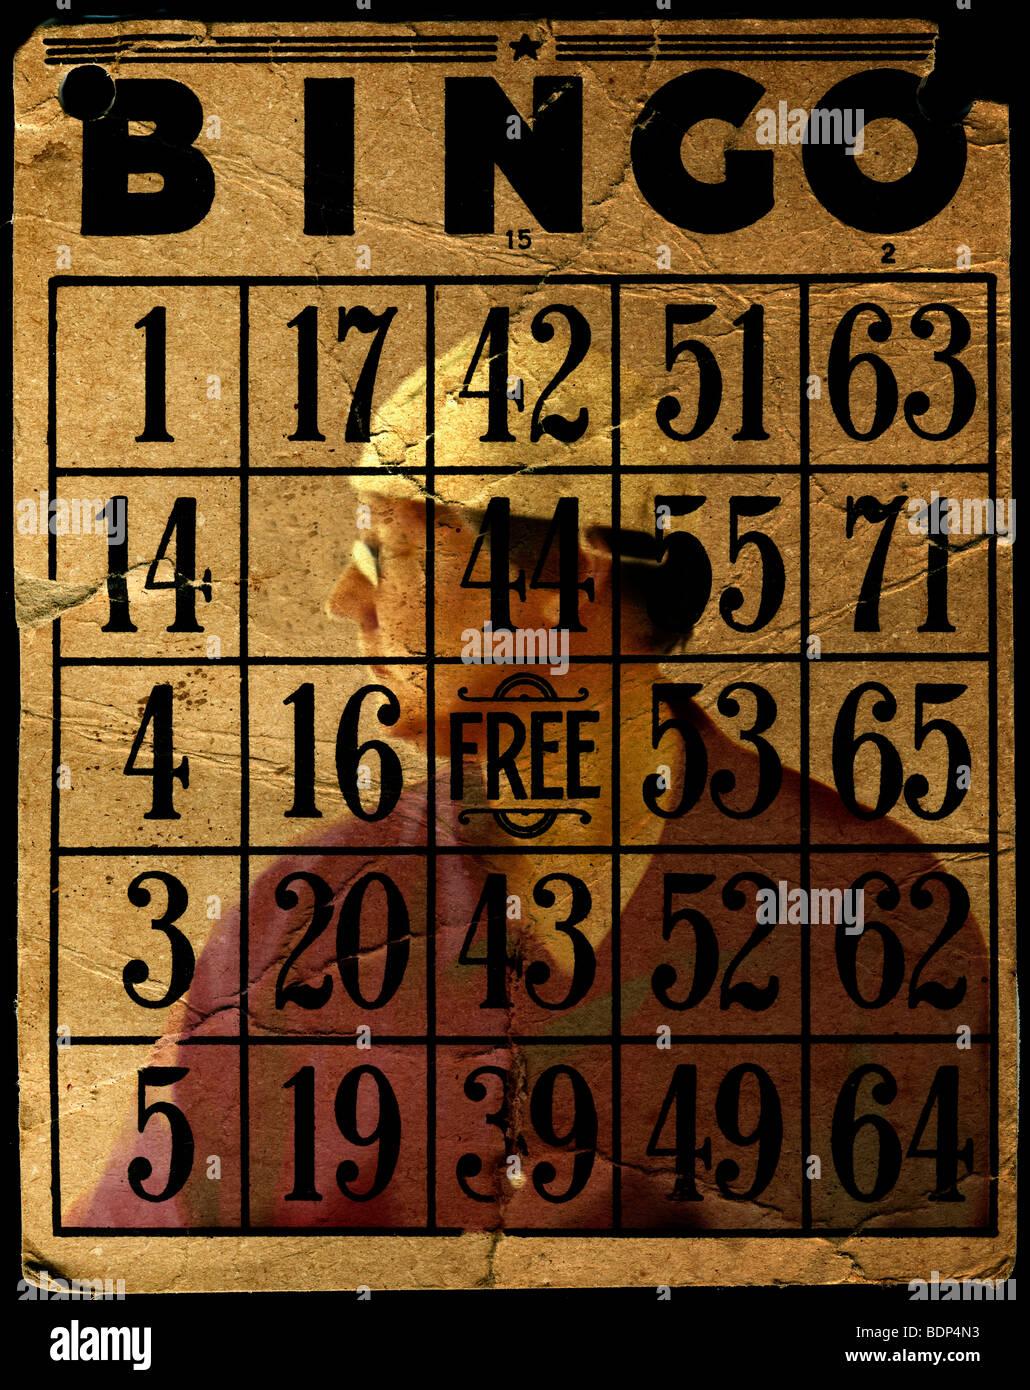 Bingo numbers with a figure - Stock Image